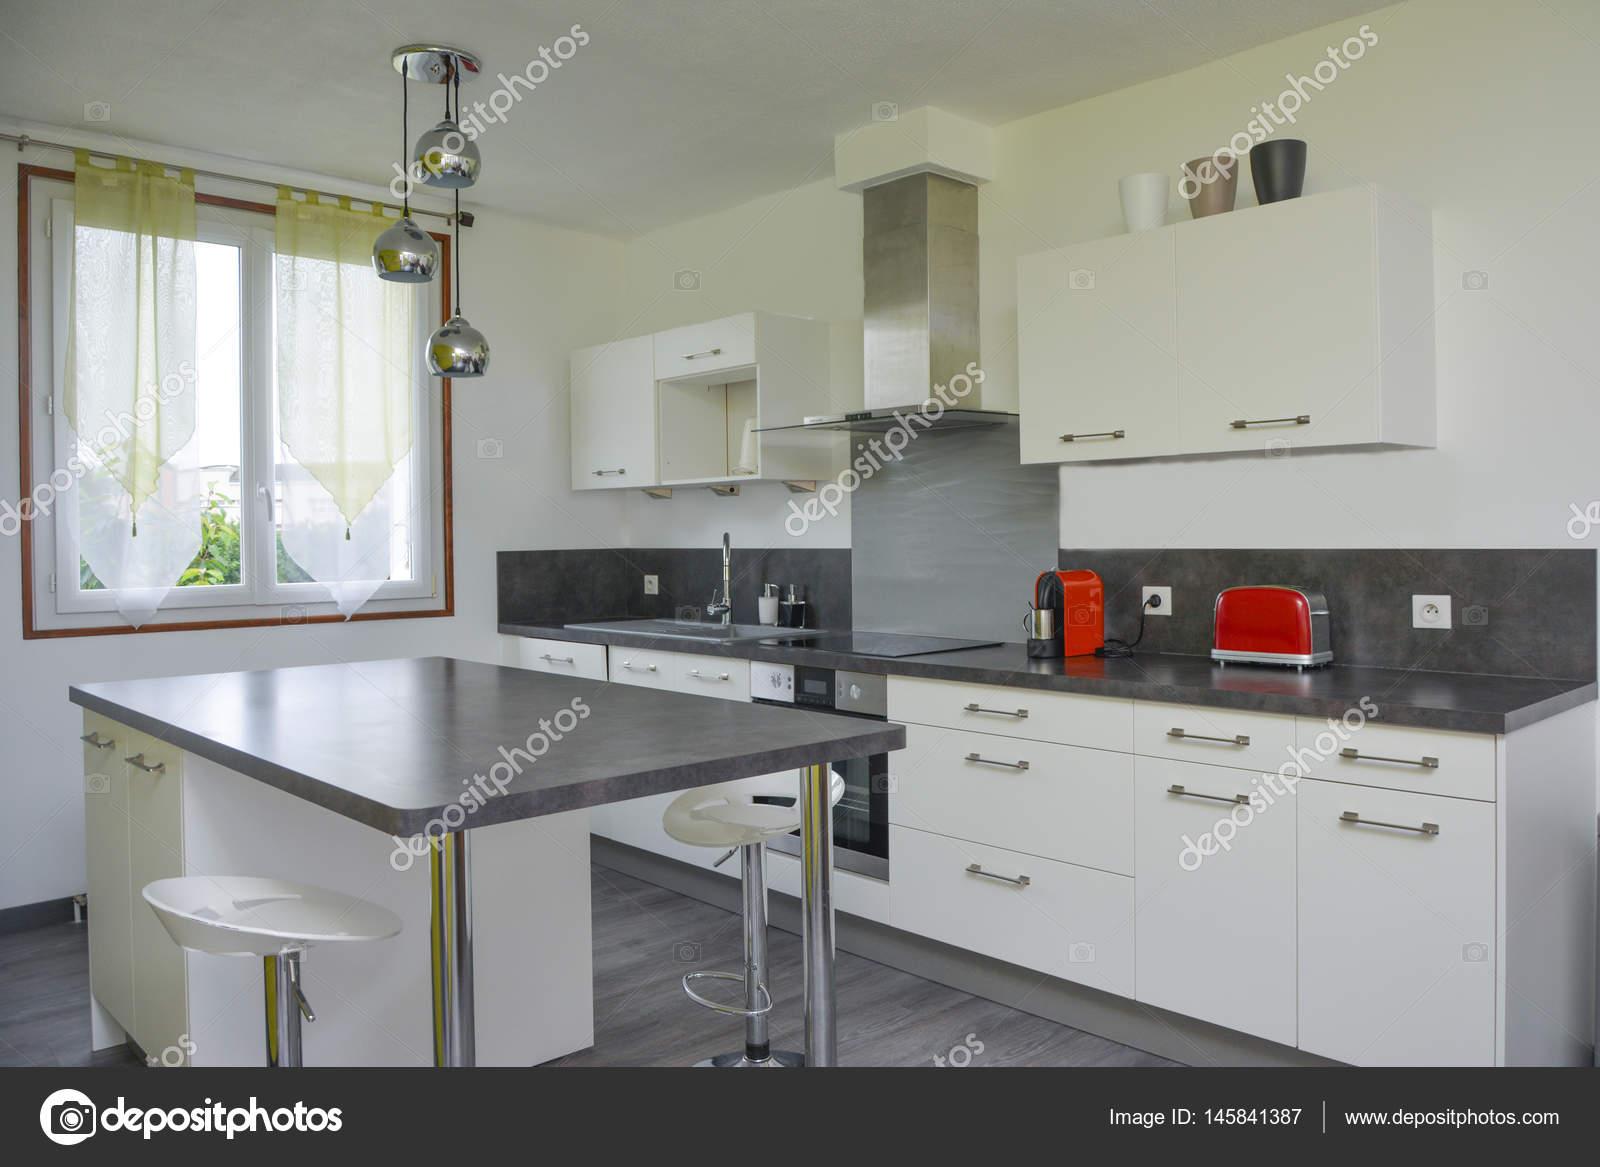 estilo moderno de cocina comedor — Foto de stock © kipgodi #145841387